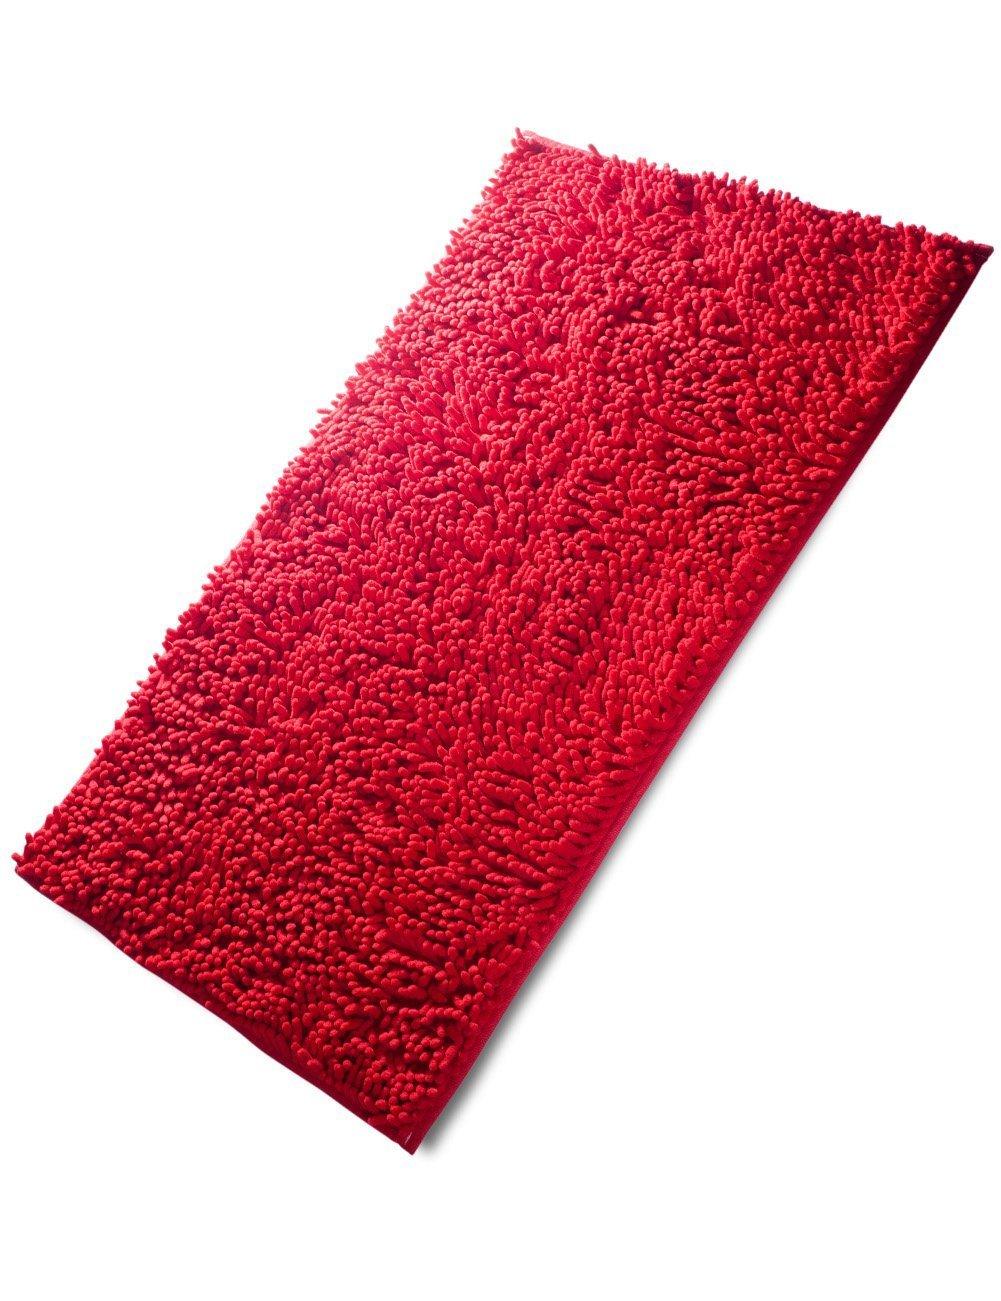 Fadesun Super Soft Absorbent Non-Slip Microfiber Chenille Carpet/Doormat/Bath Mat/Rug Carpet/Floor Rug Bedroom, Sitting Room, Corridor, Kitchen, Bathroom Car Seats, Shower, 20x32, Red 20x32 COMIN18JU072139